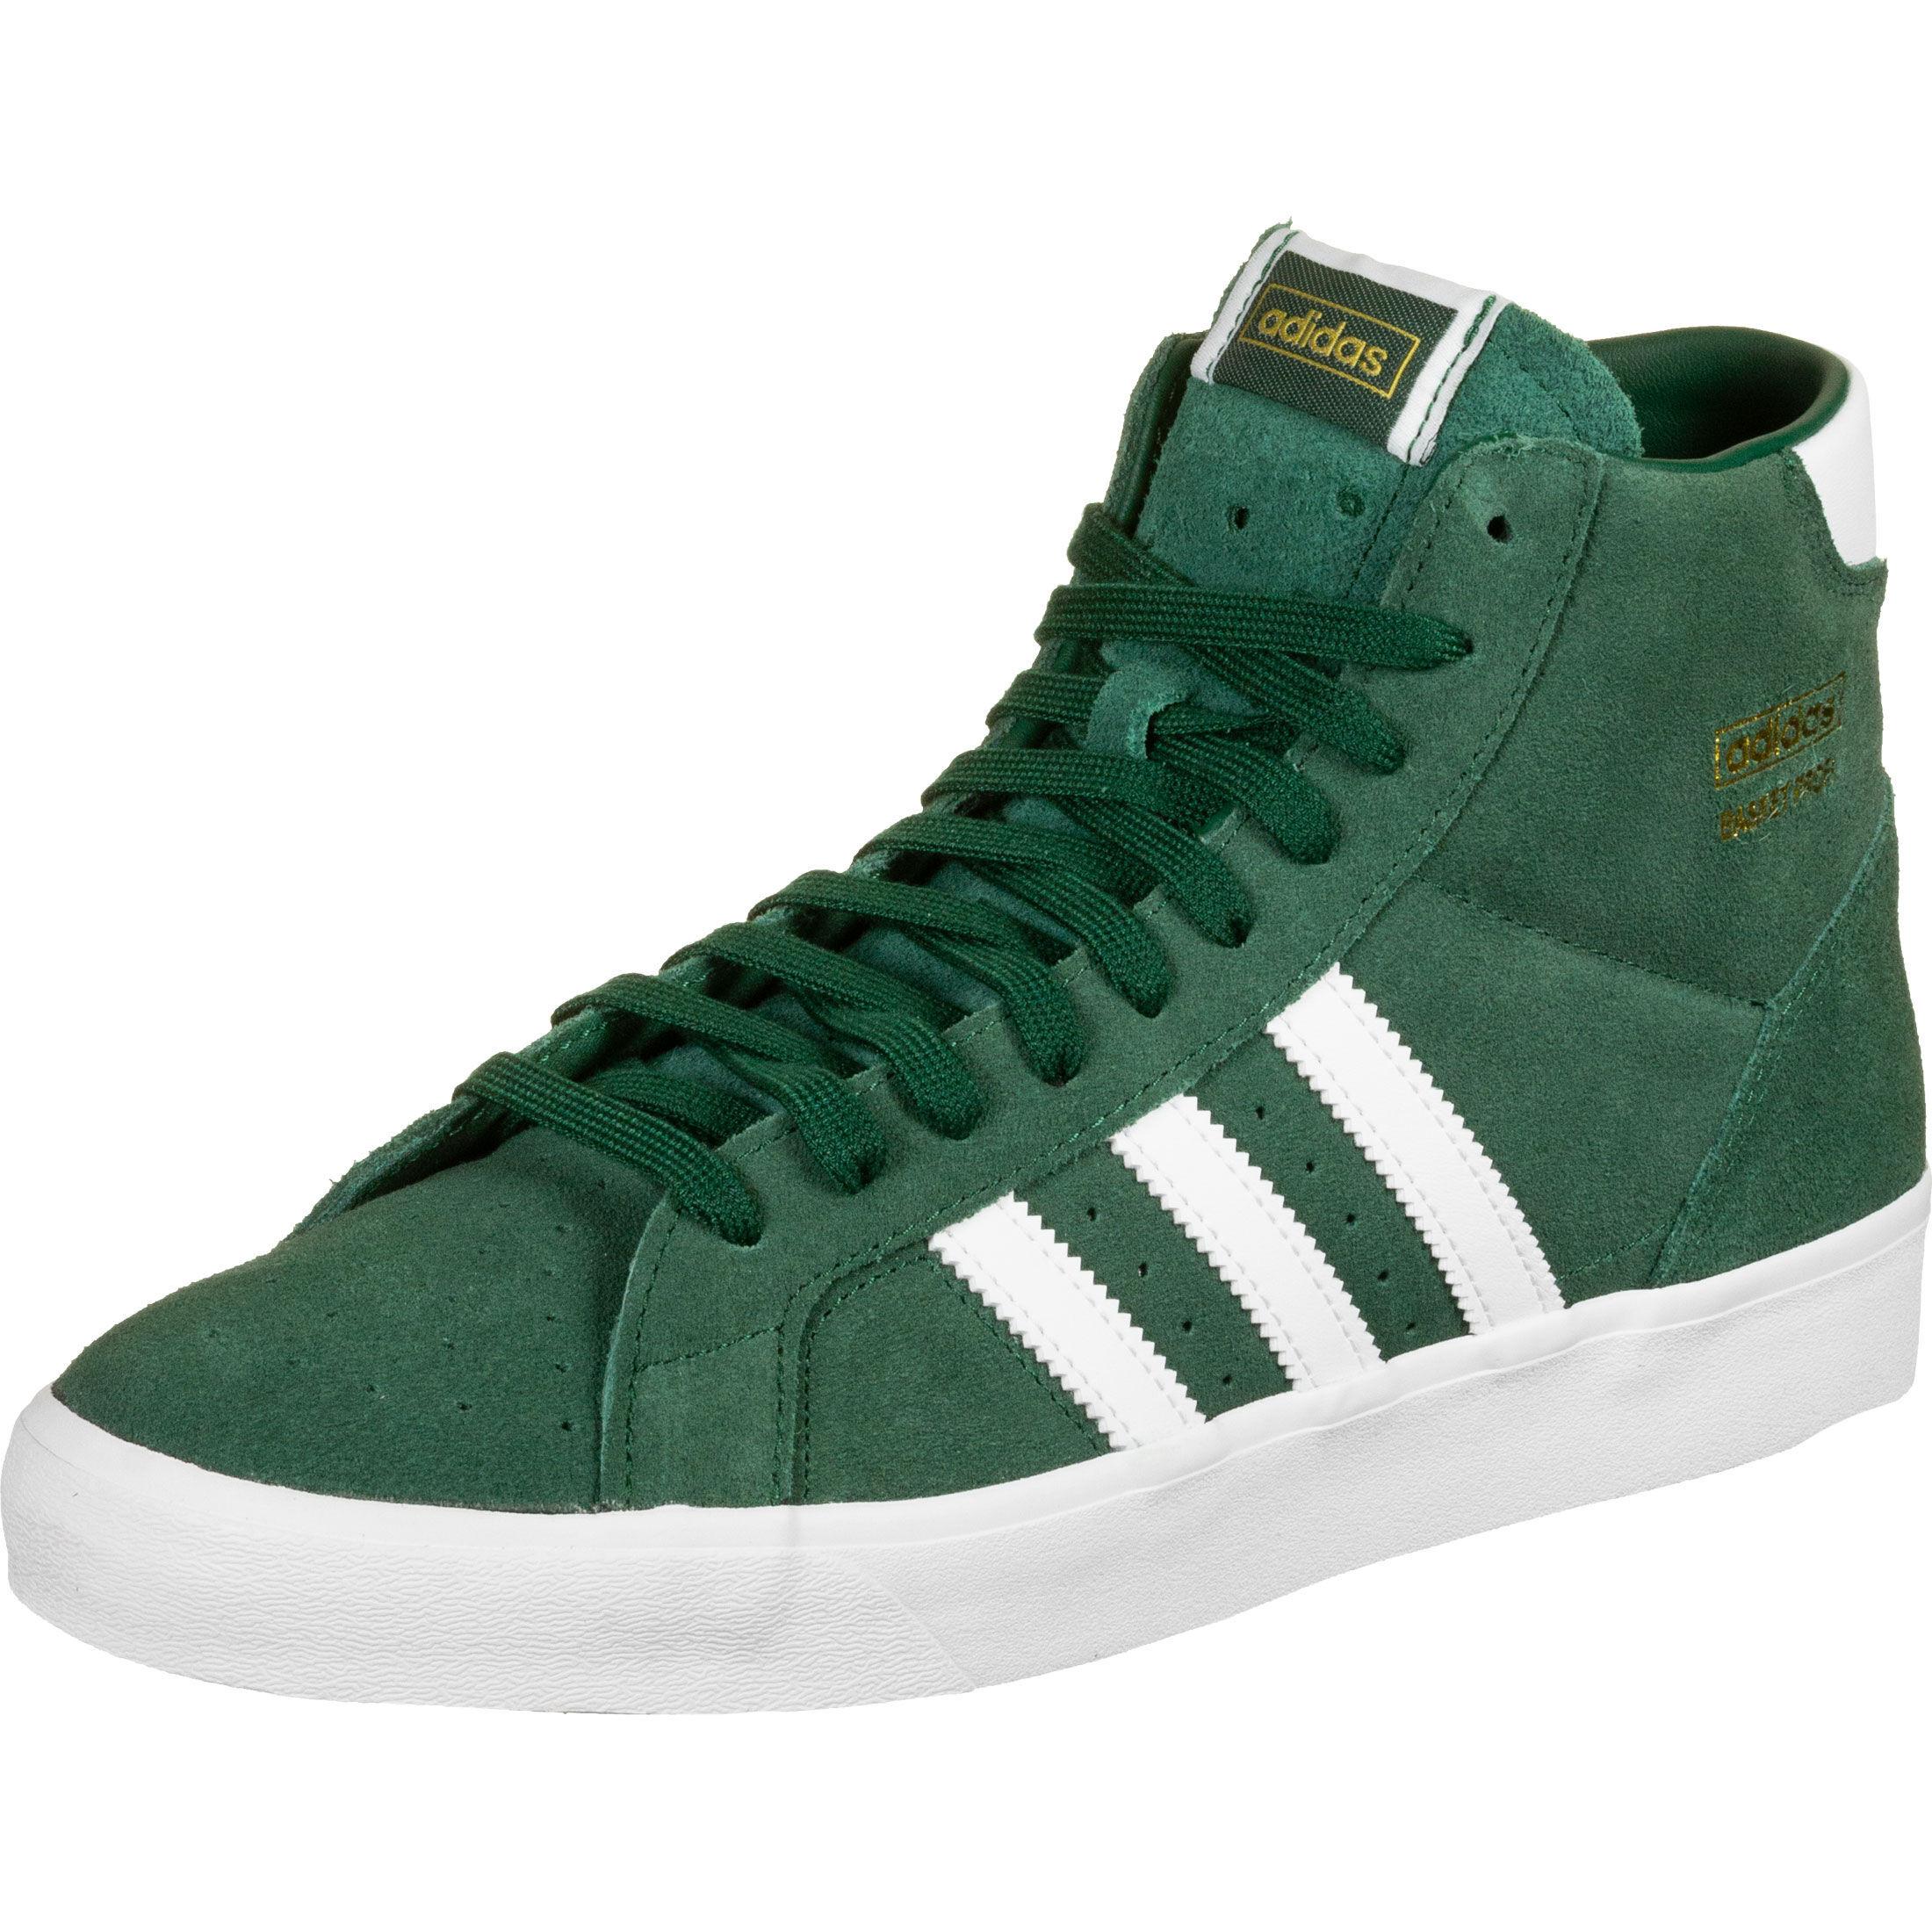 adidas BASKET PROFI, 47 1/3 EU, vert